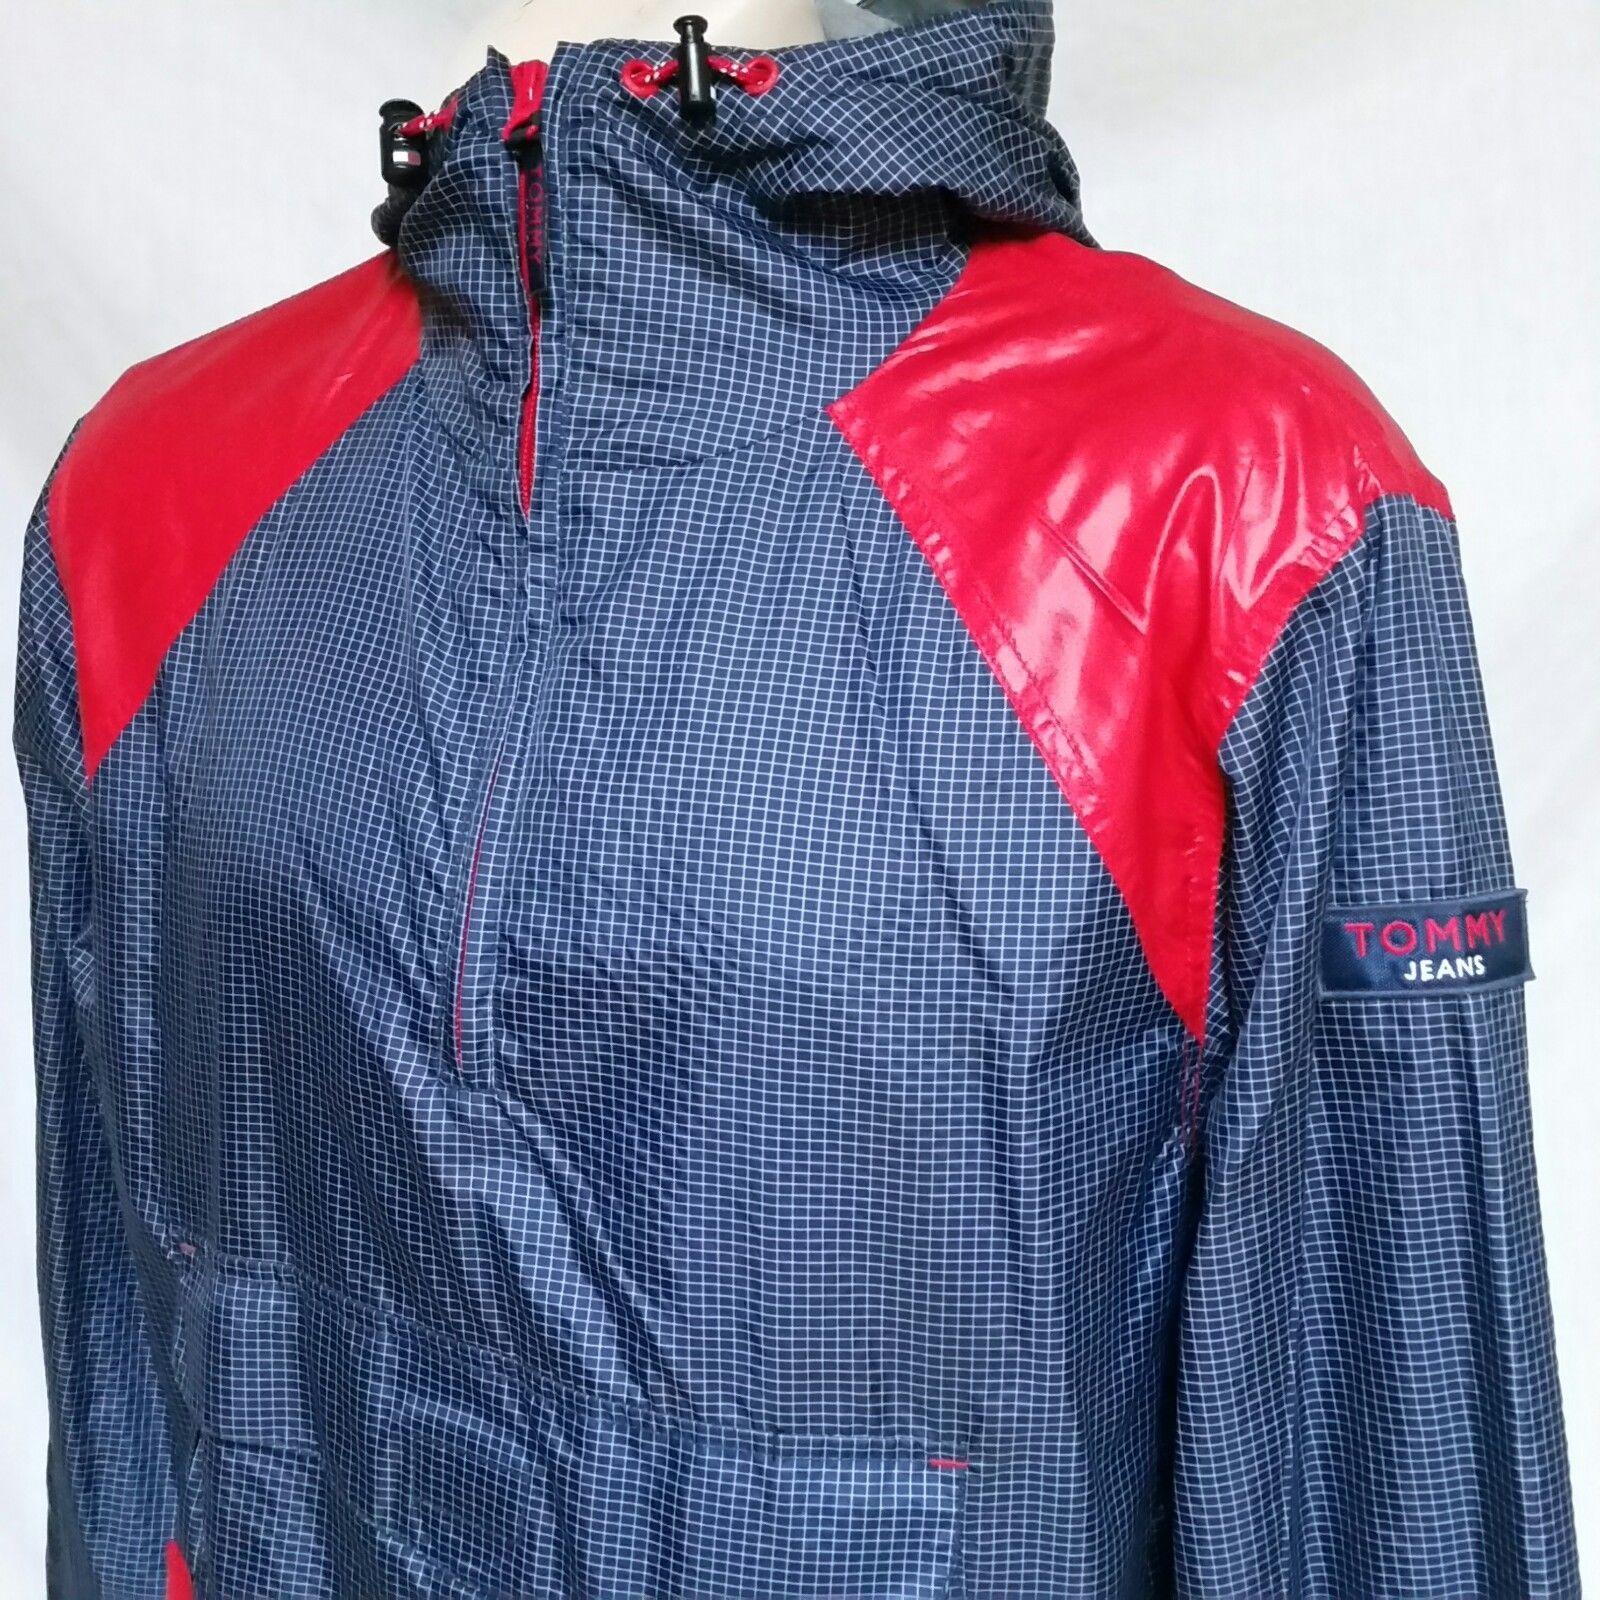 VTG 90s Tommy Hilfiger Jeans Windbreaker Jacket Colorblock Sailing Coat Medium image 2